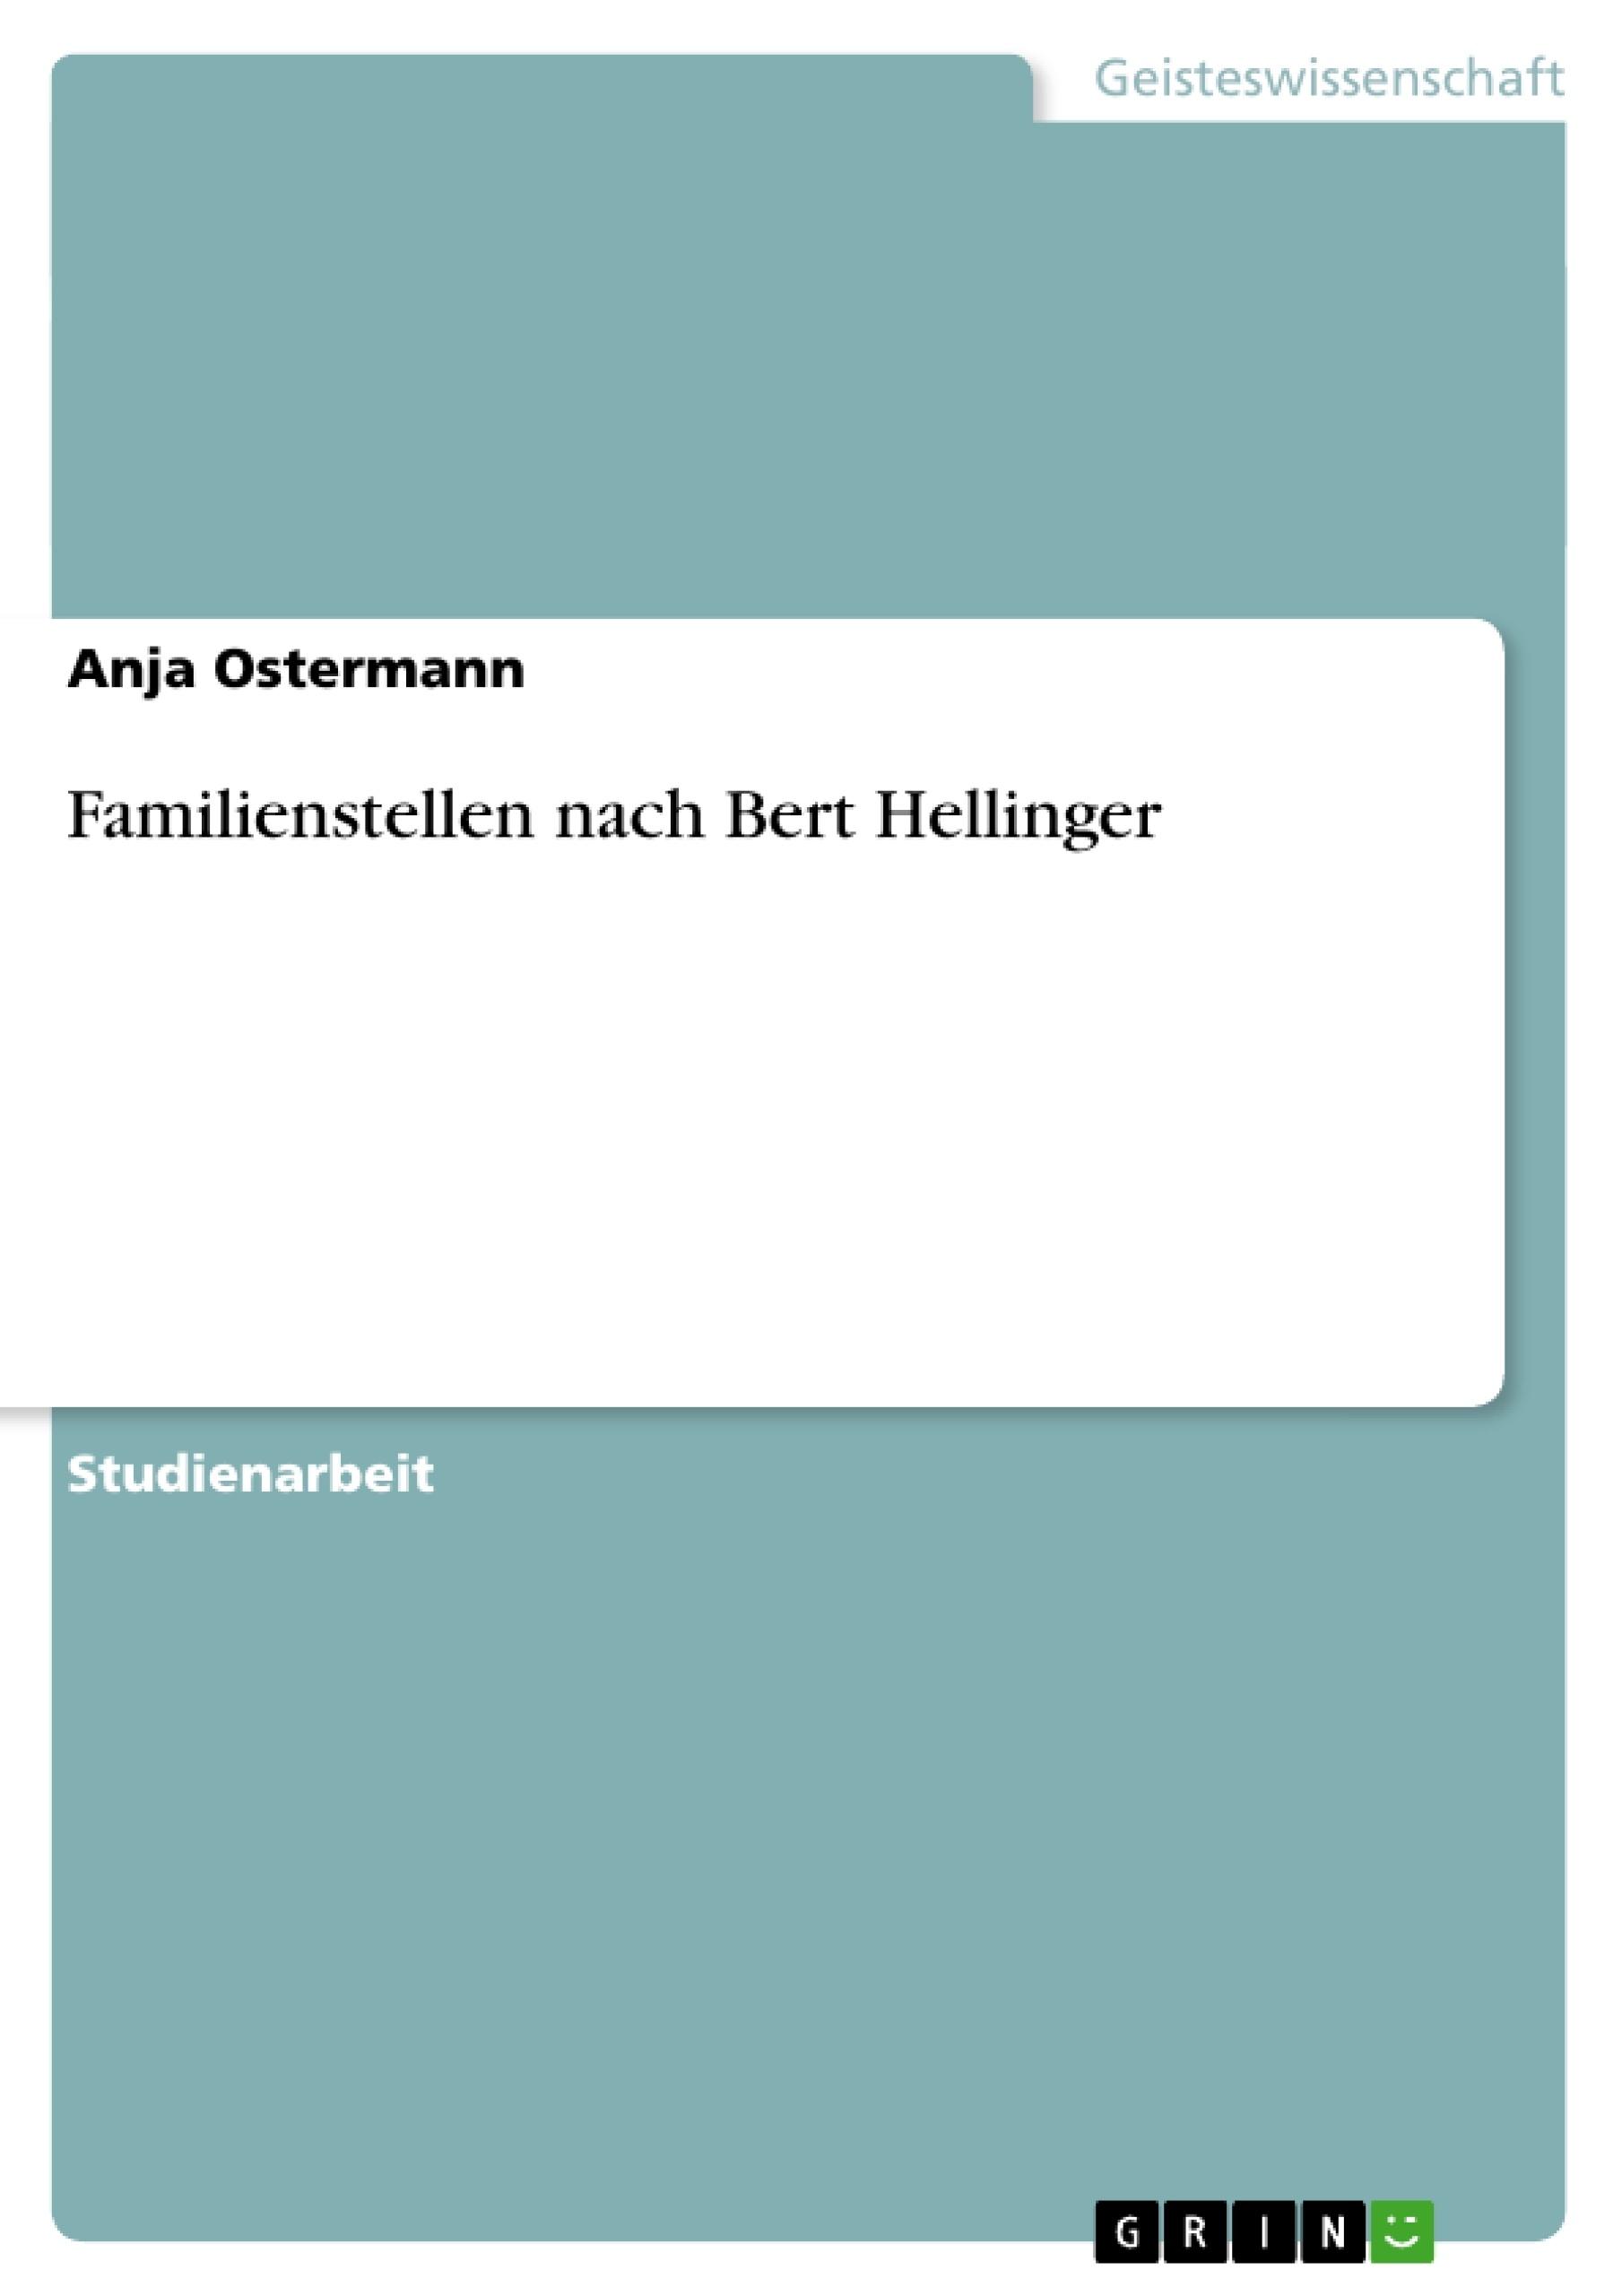 Titel: Familienstellen nach Bert Hellinger